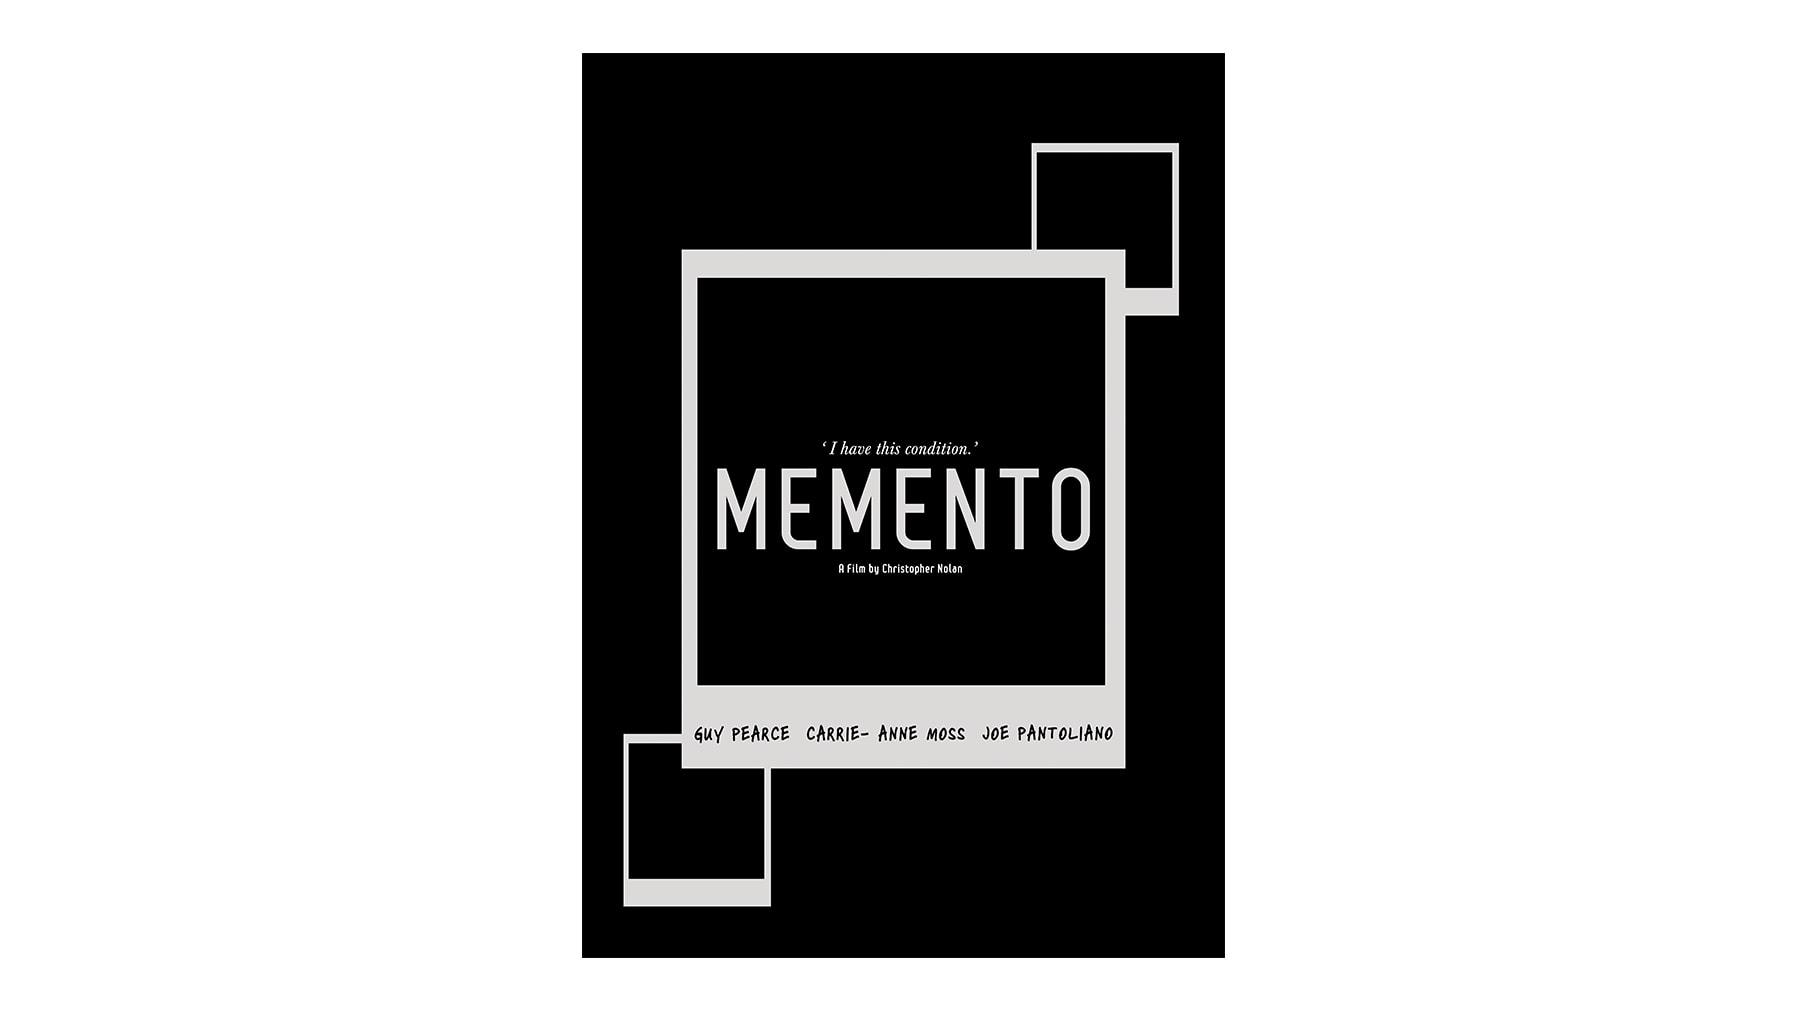 Memento_Film